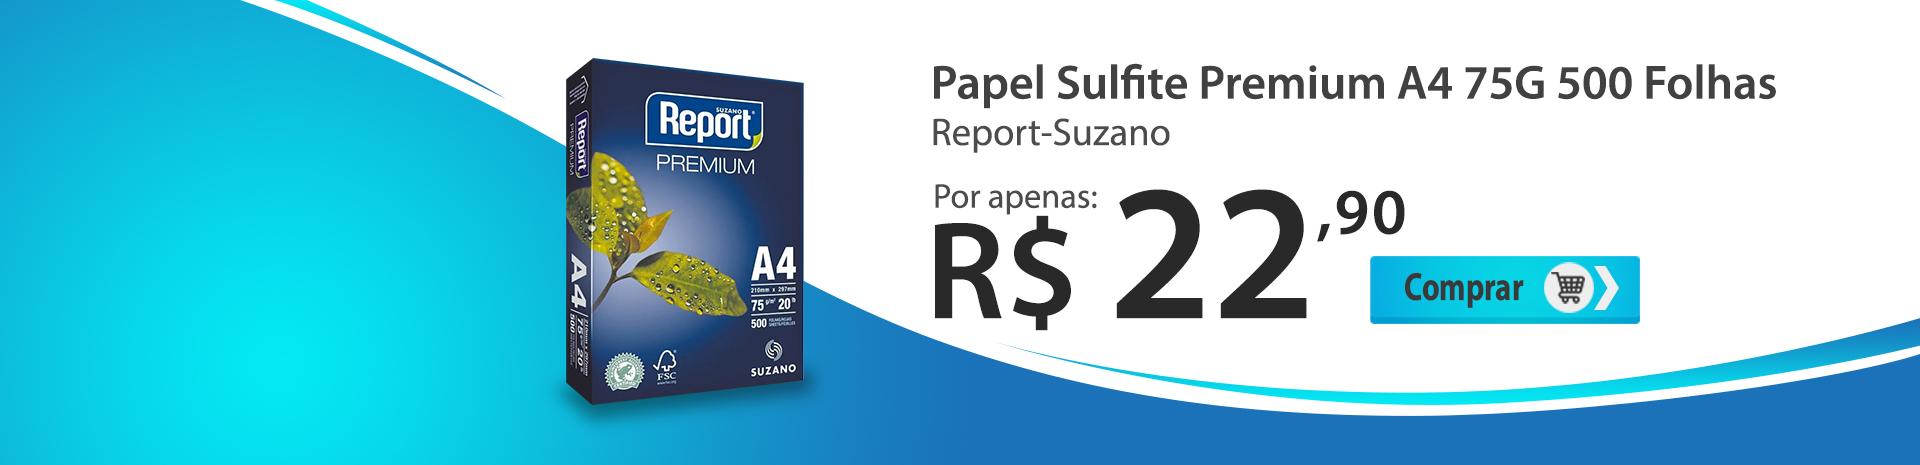 banner categoria sulfite report